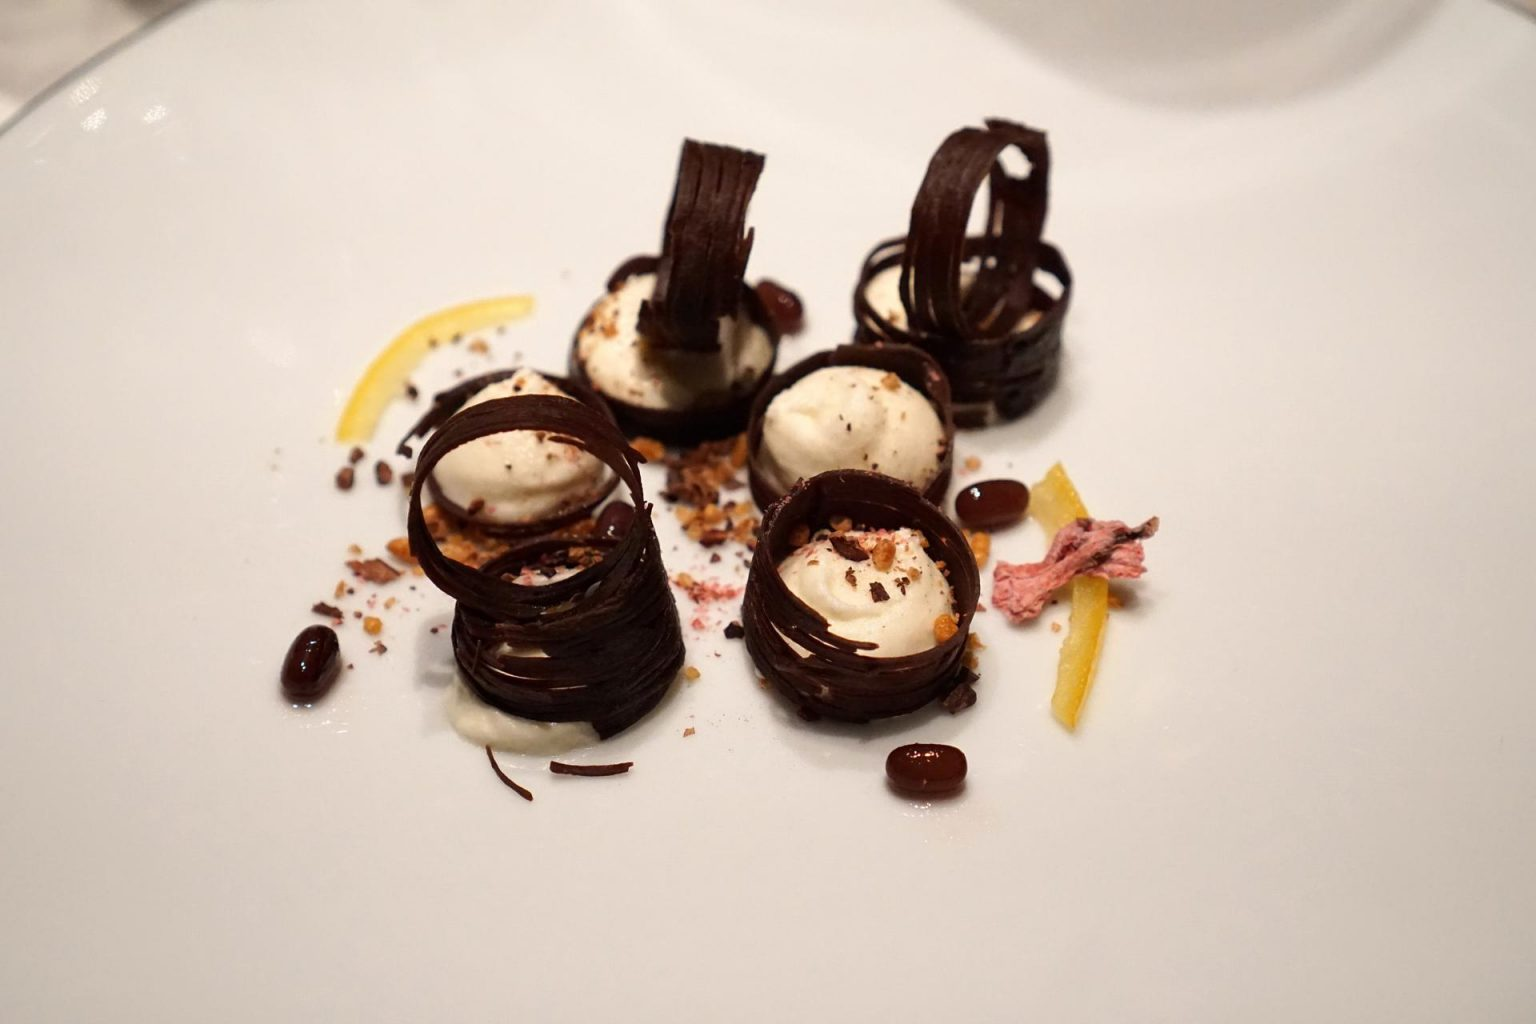 Troisgros, Ouches, dessert